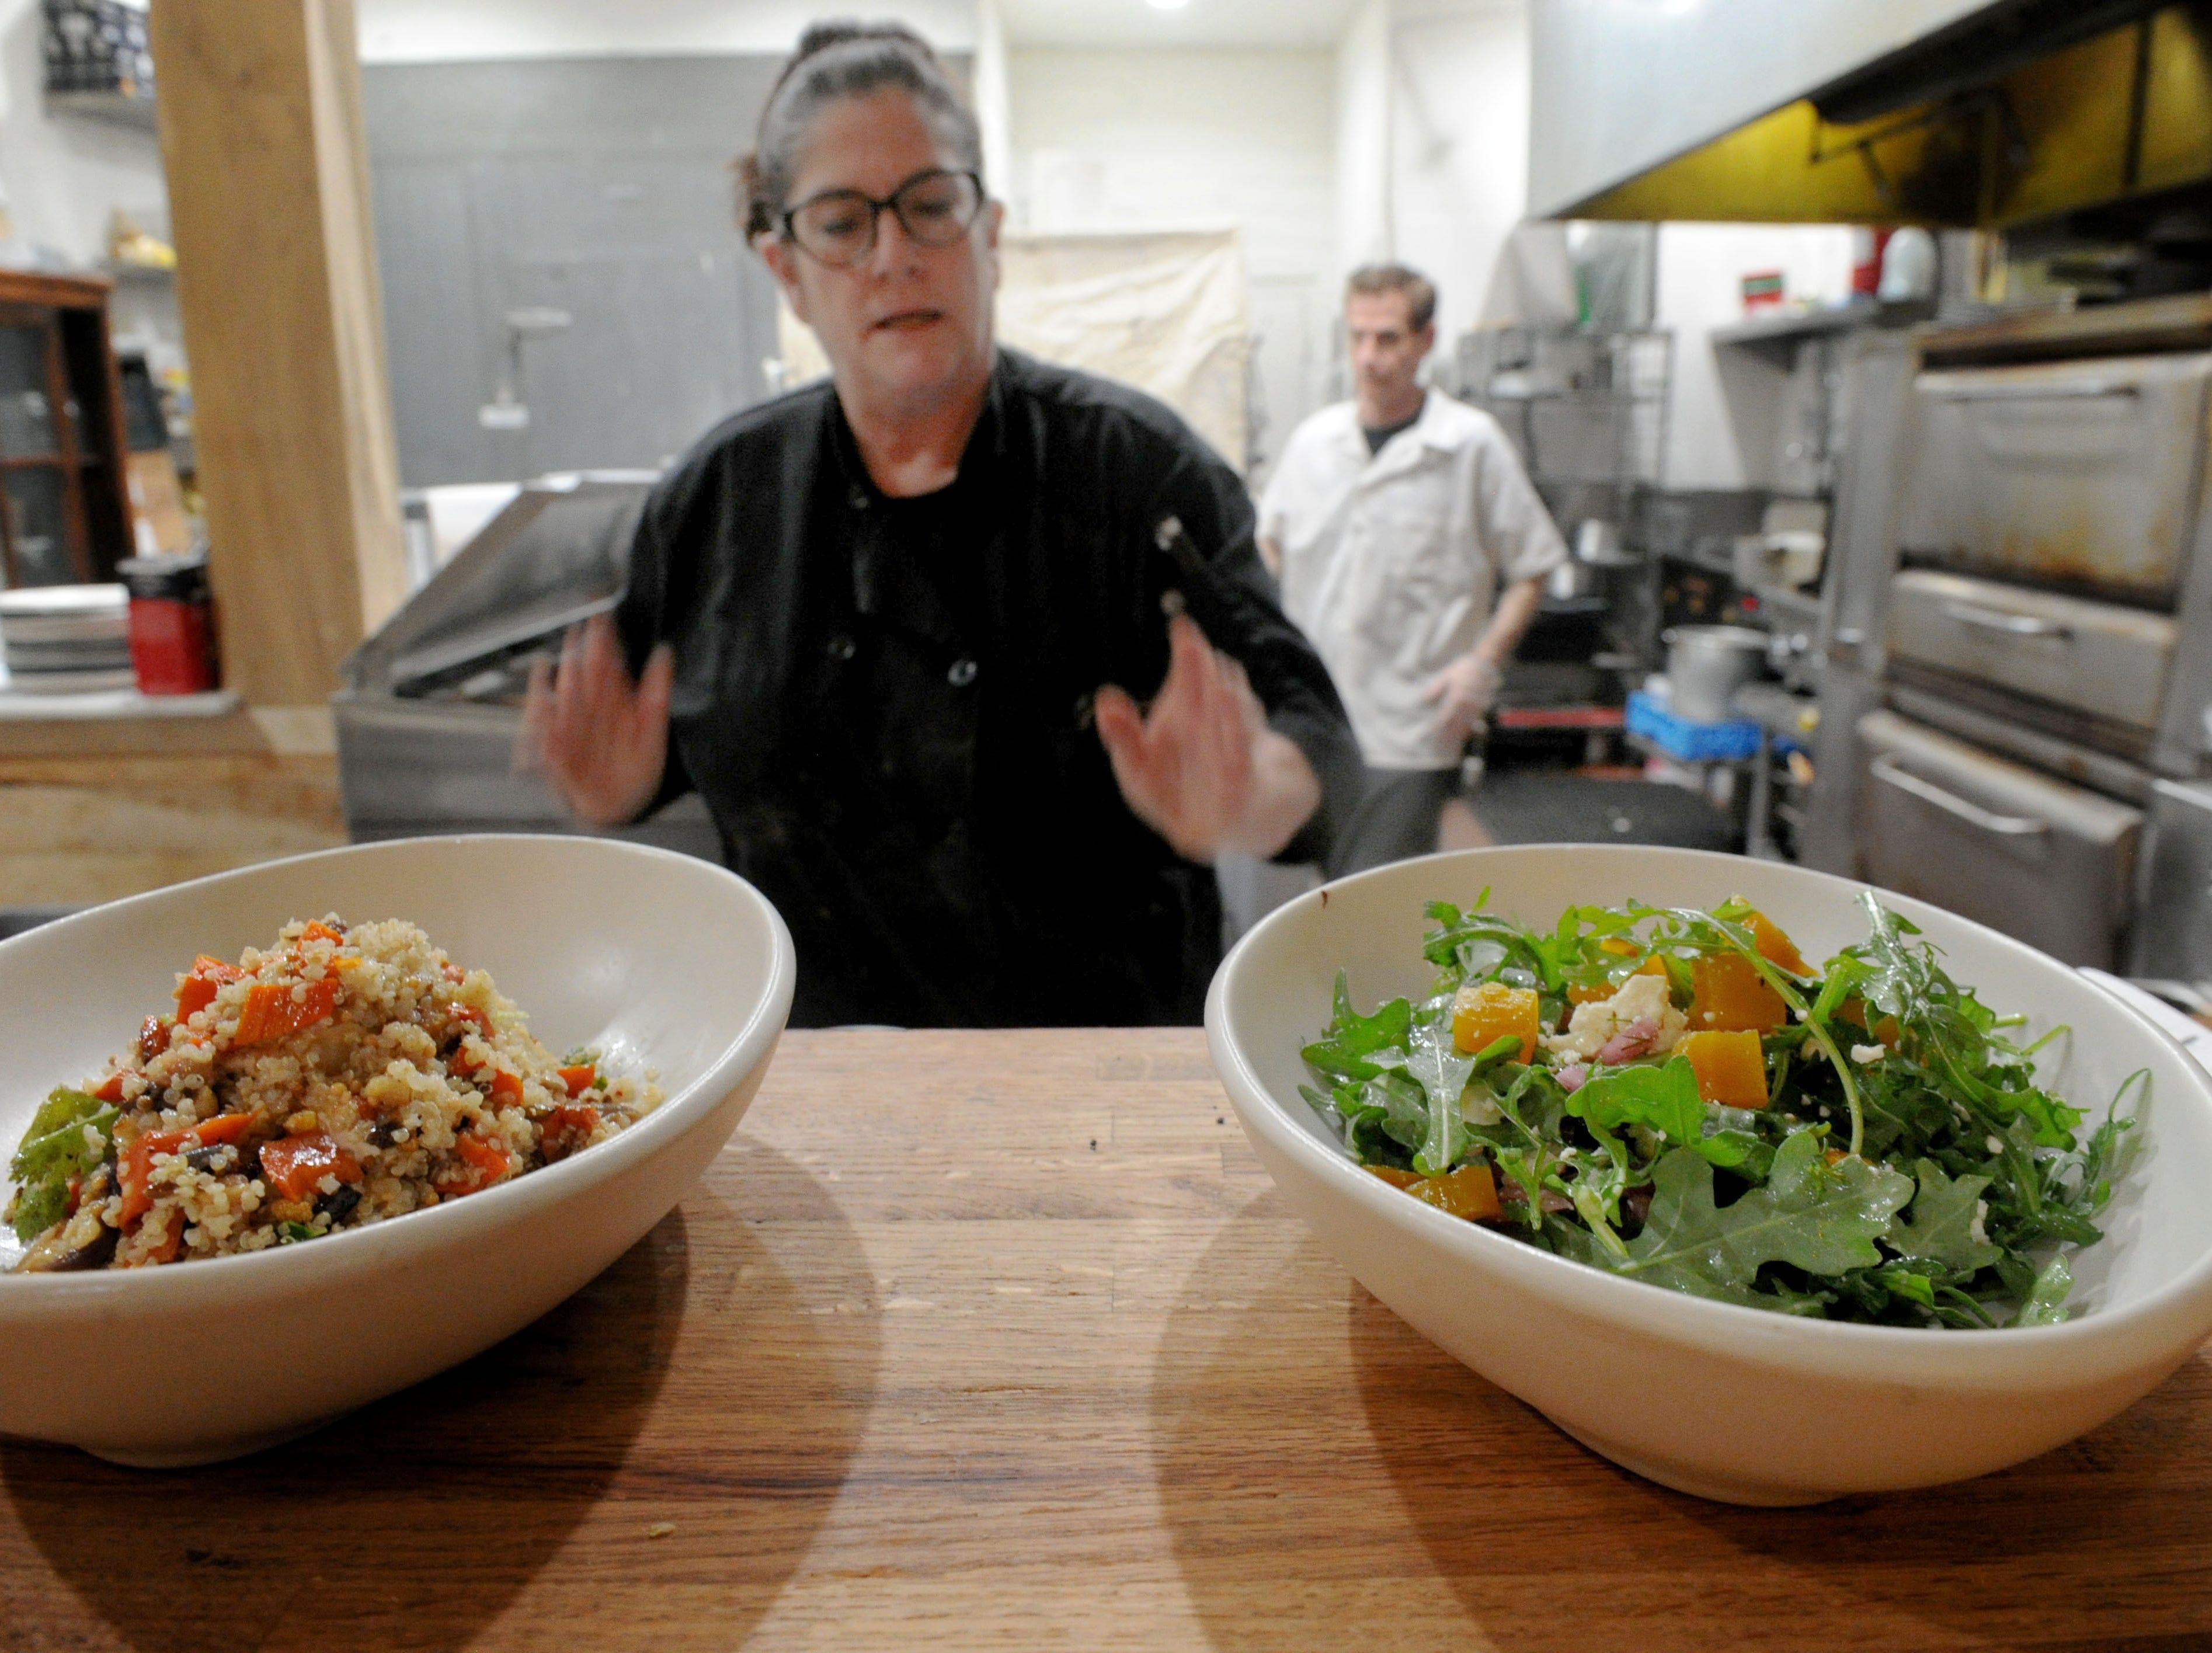 Robin Carpenter, cook at the Decker Kitchen in Westlake Village, serves charred vegetable quinoa and roasted beet salad.